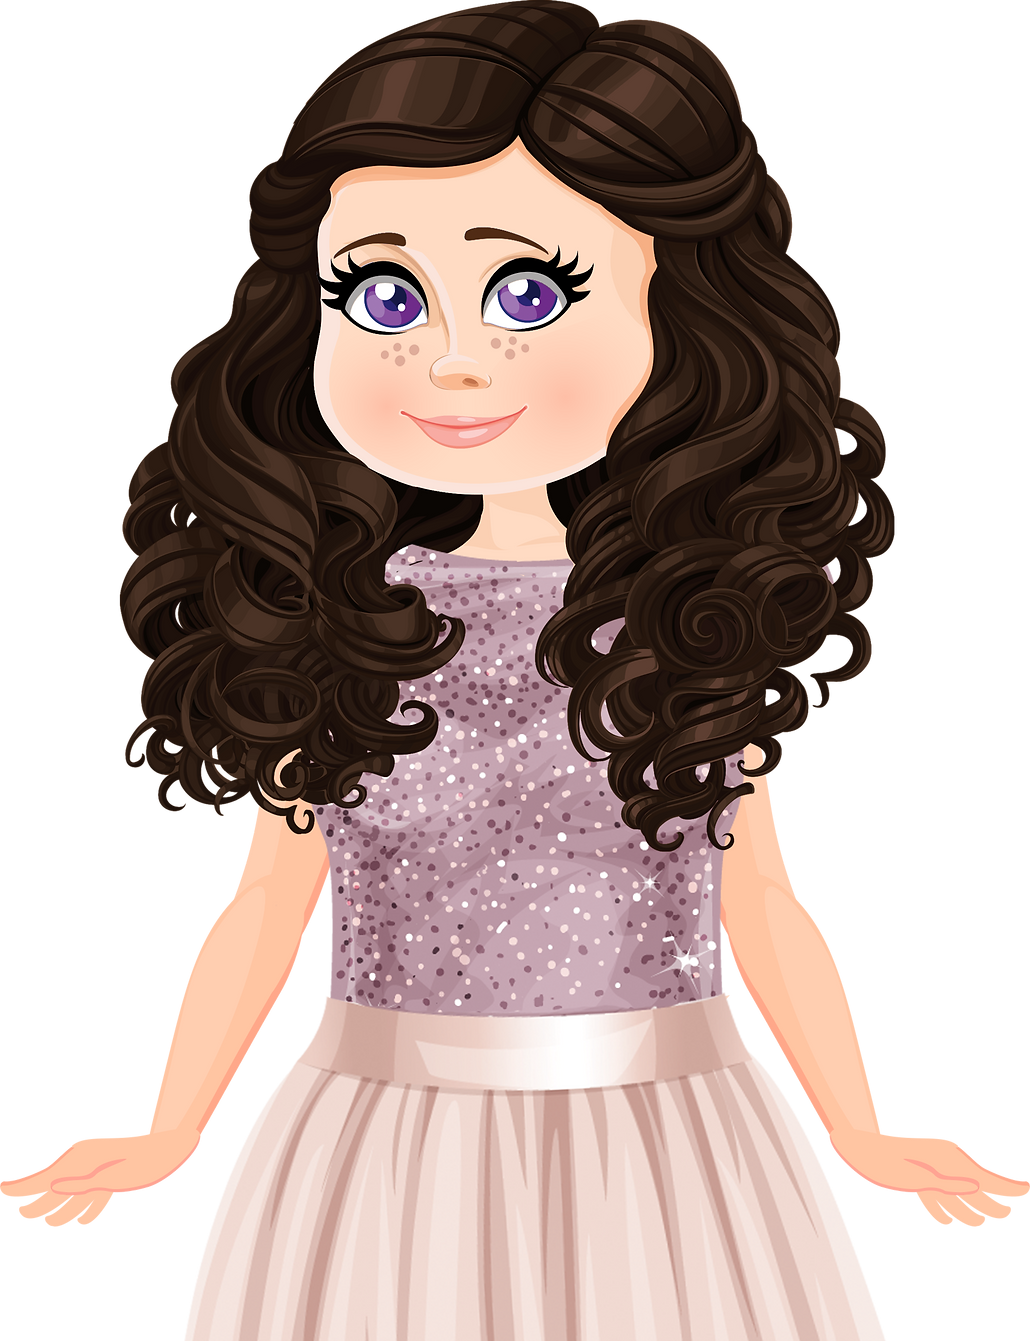 purple gown copy.png